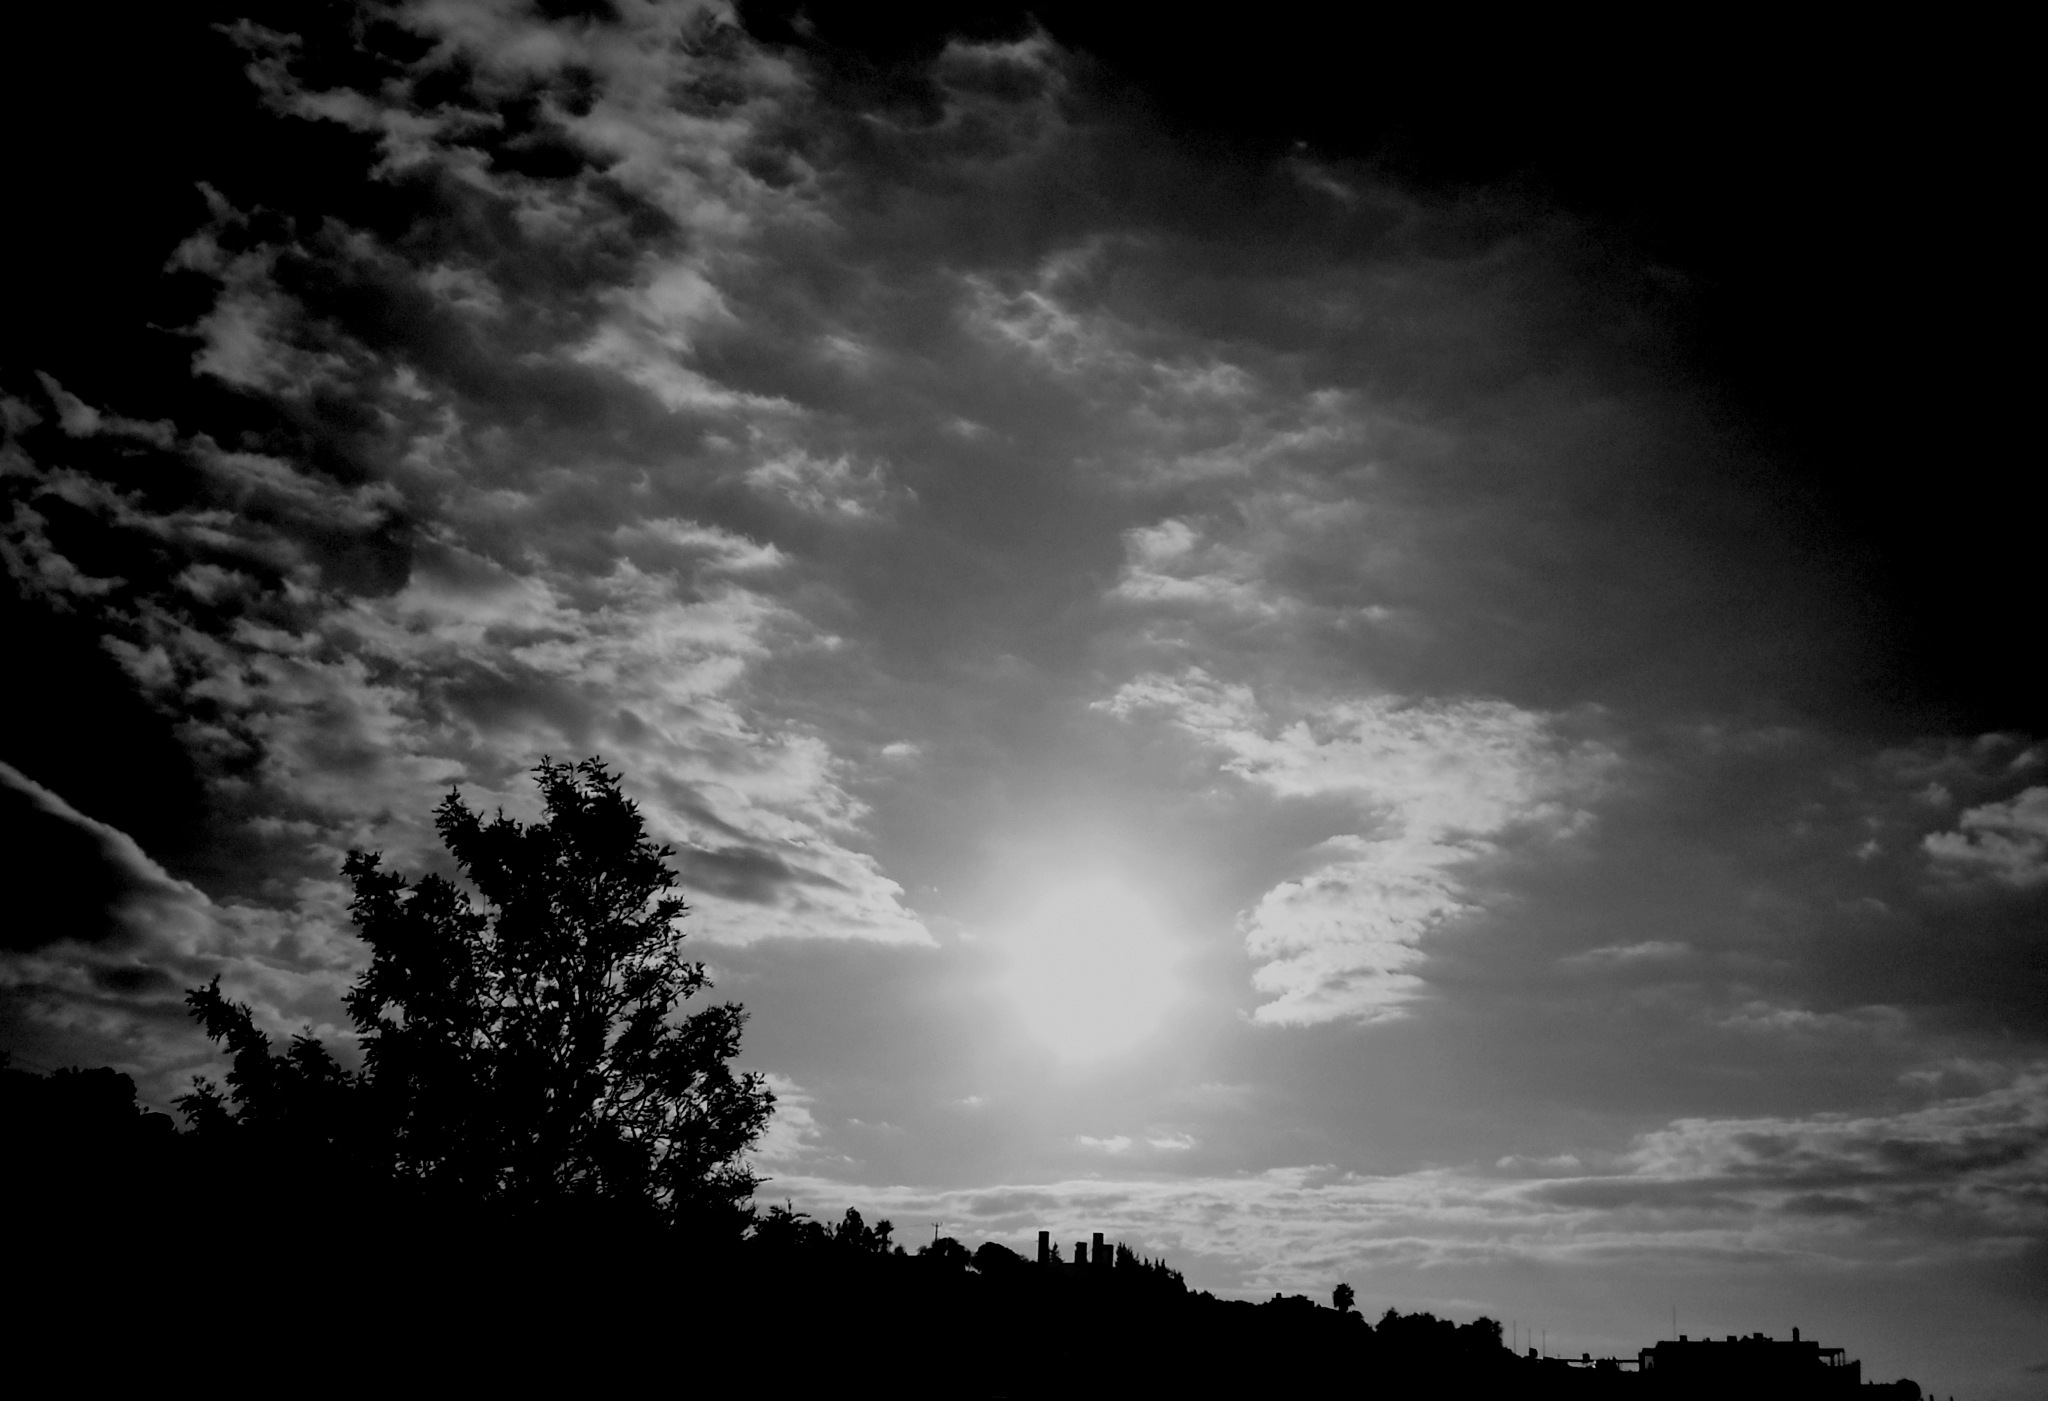 TALES OF 1001 NIGHTS 15, B&W, FULL SCREEN by Akin Saner